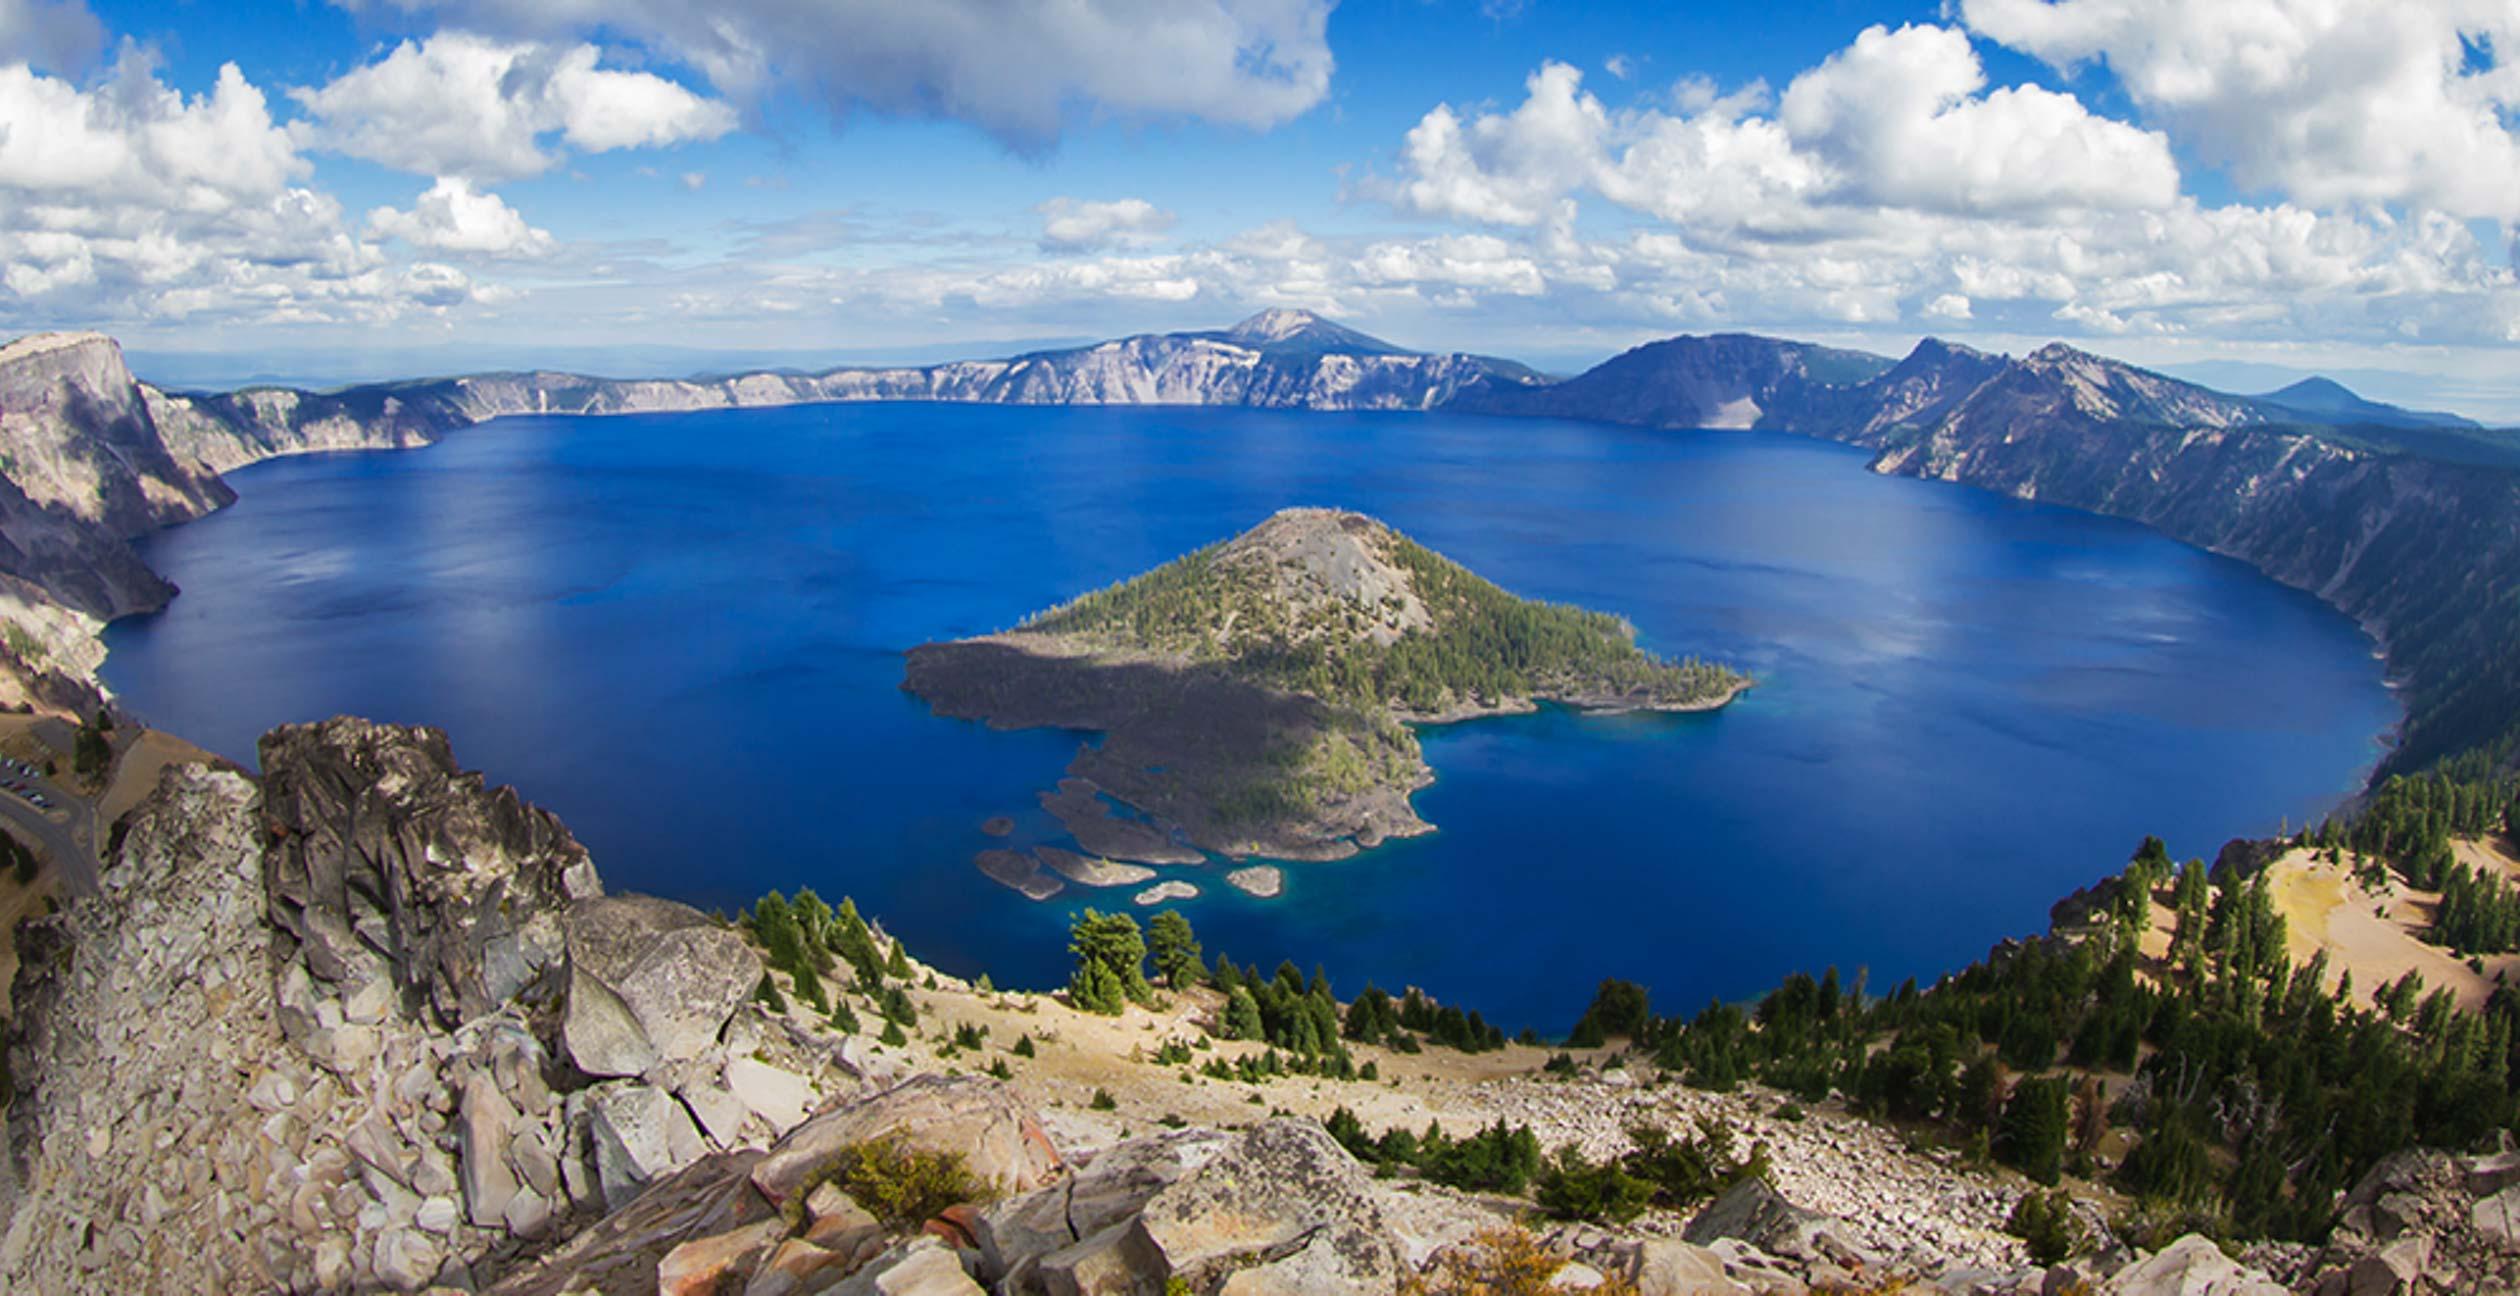 Crater lake, beautiful blue waters